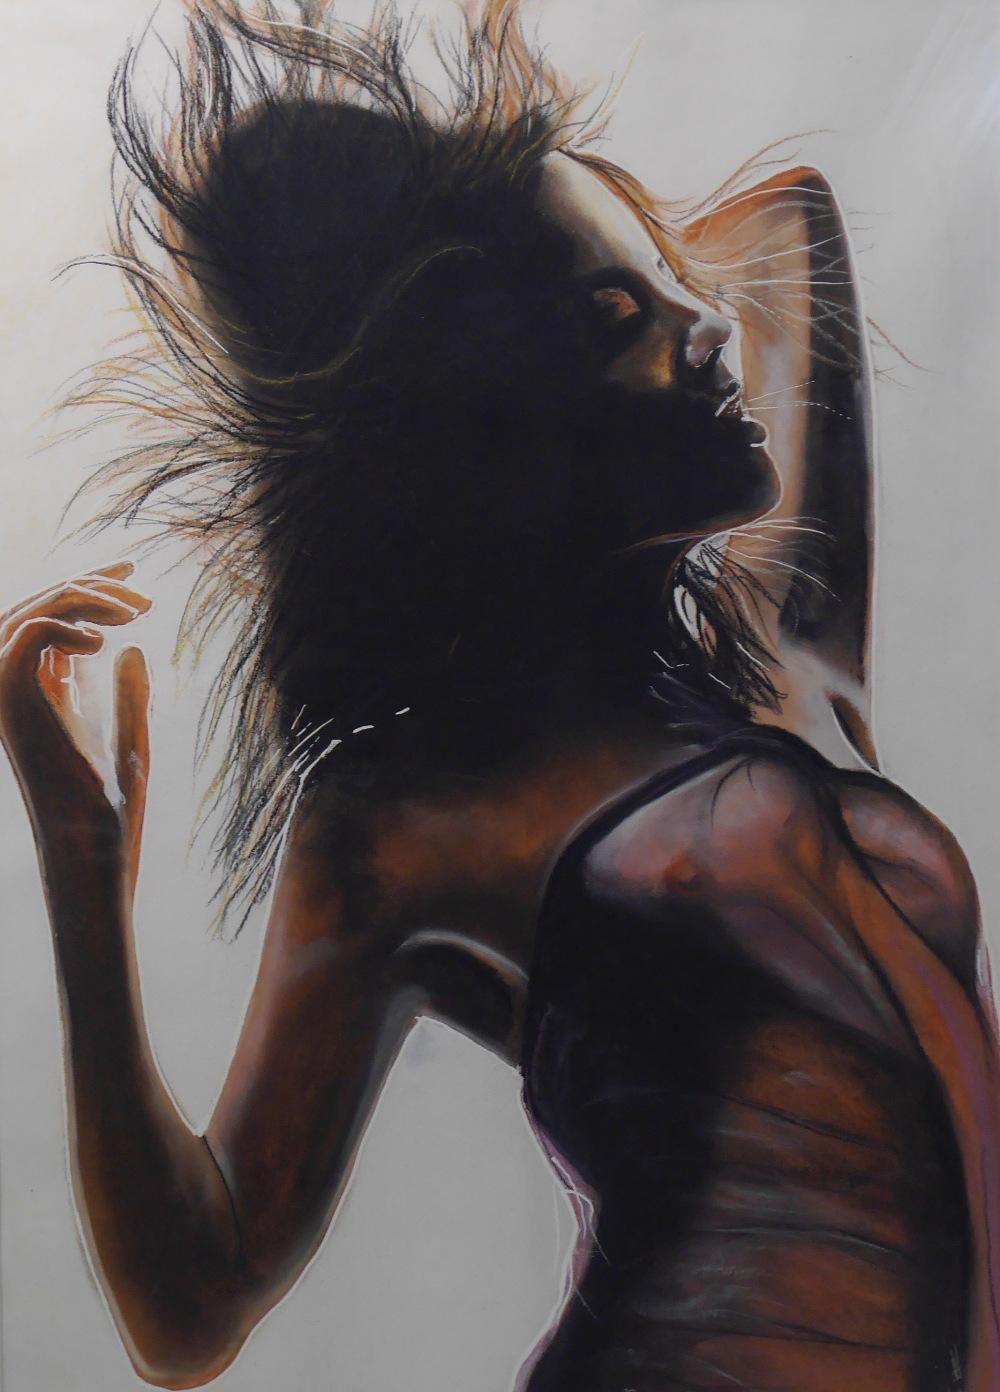 Lot 1 - Nude Art - Portrait of a Nude Female Signed AF